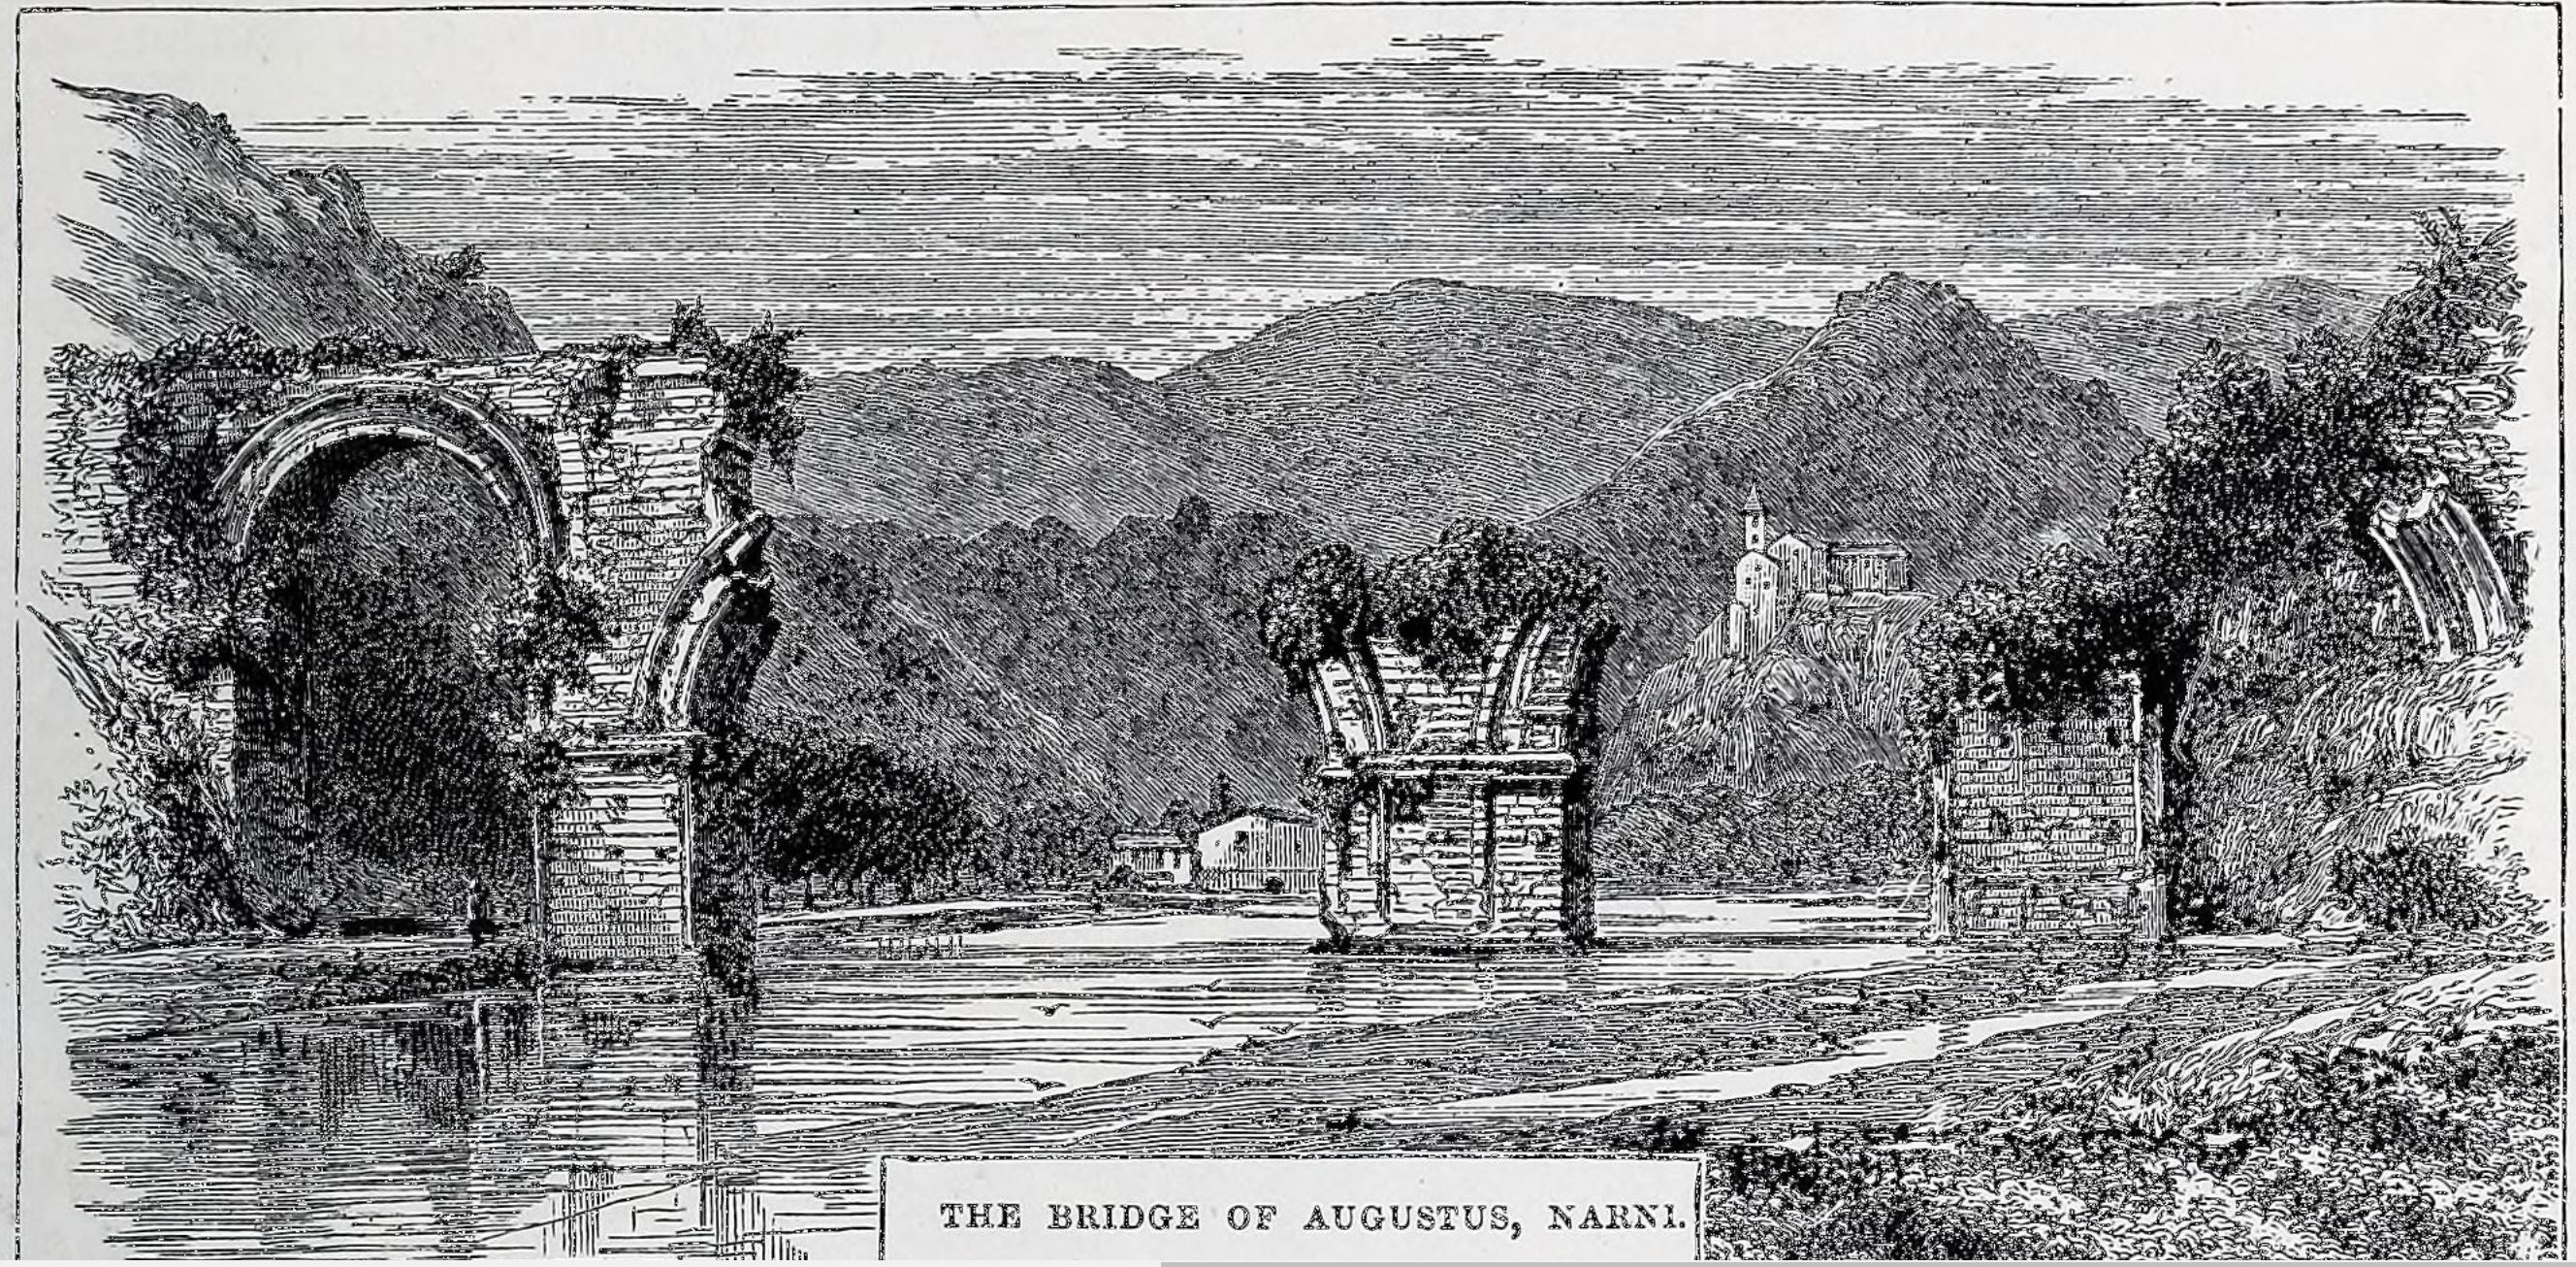 1878 The Magazine of art London, New York, Cassell, Petter & Gallpin p 239 Morison